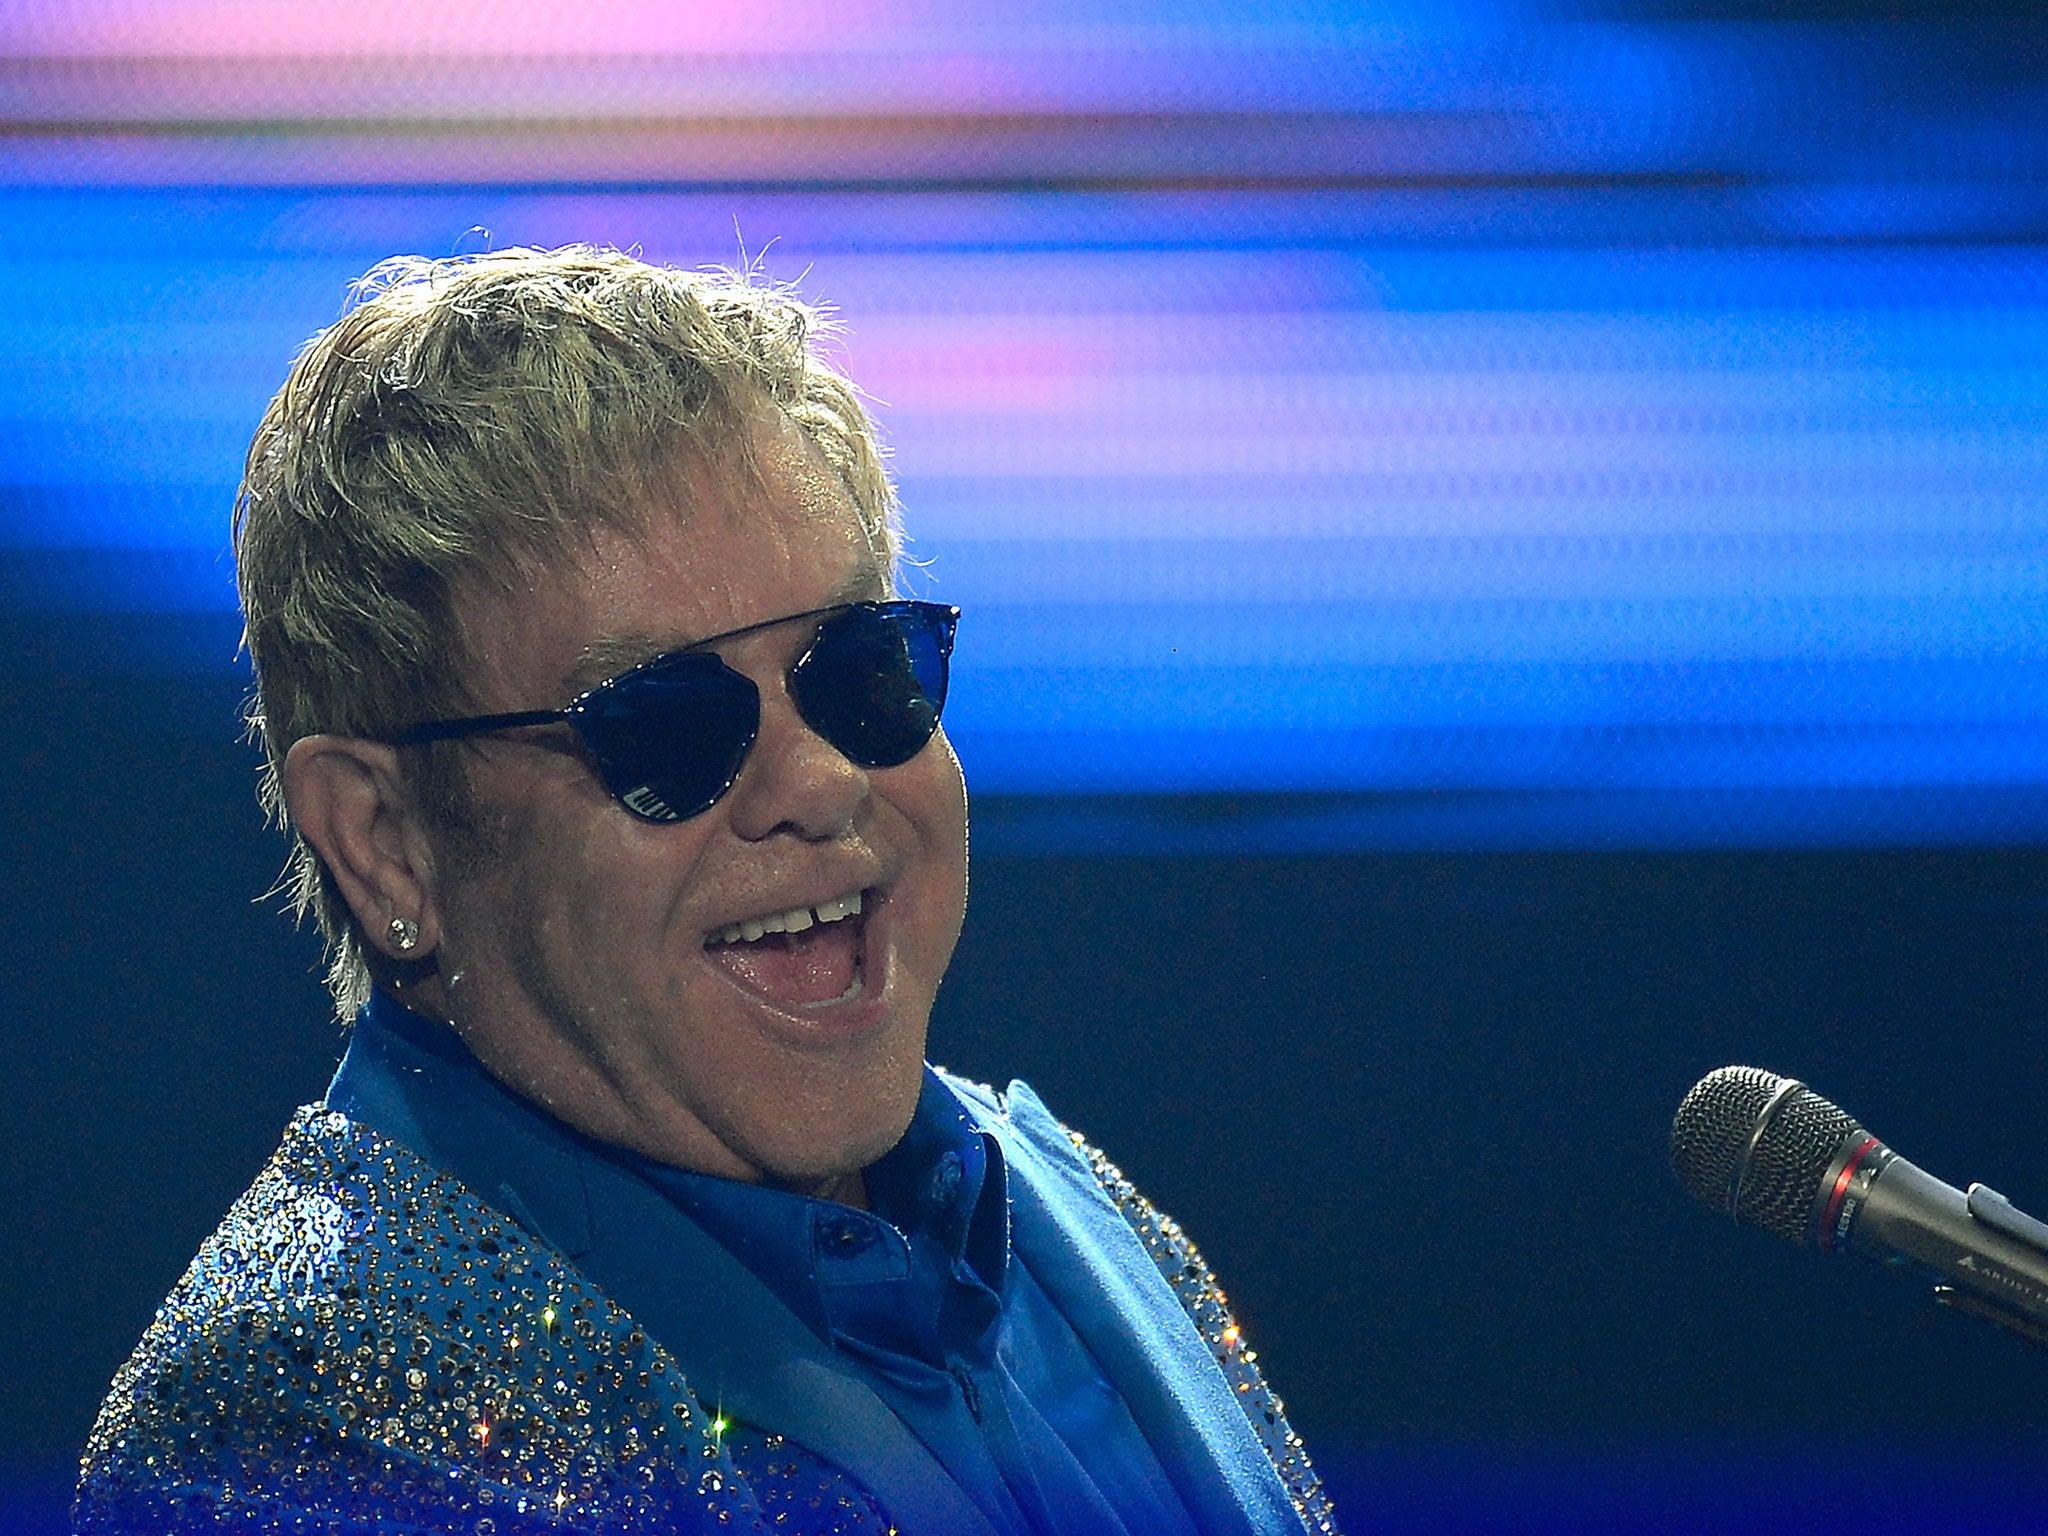 Sir Elton John Receives Phone Call From The Real President Putin